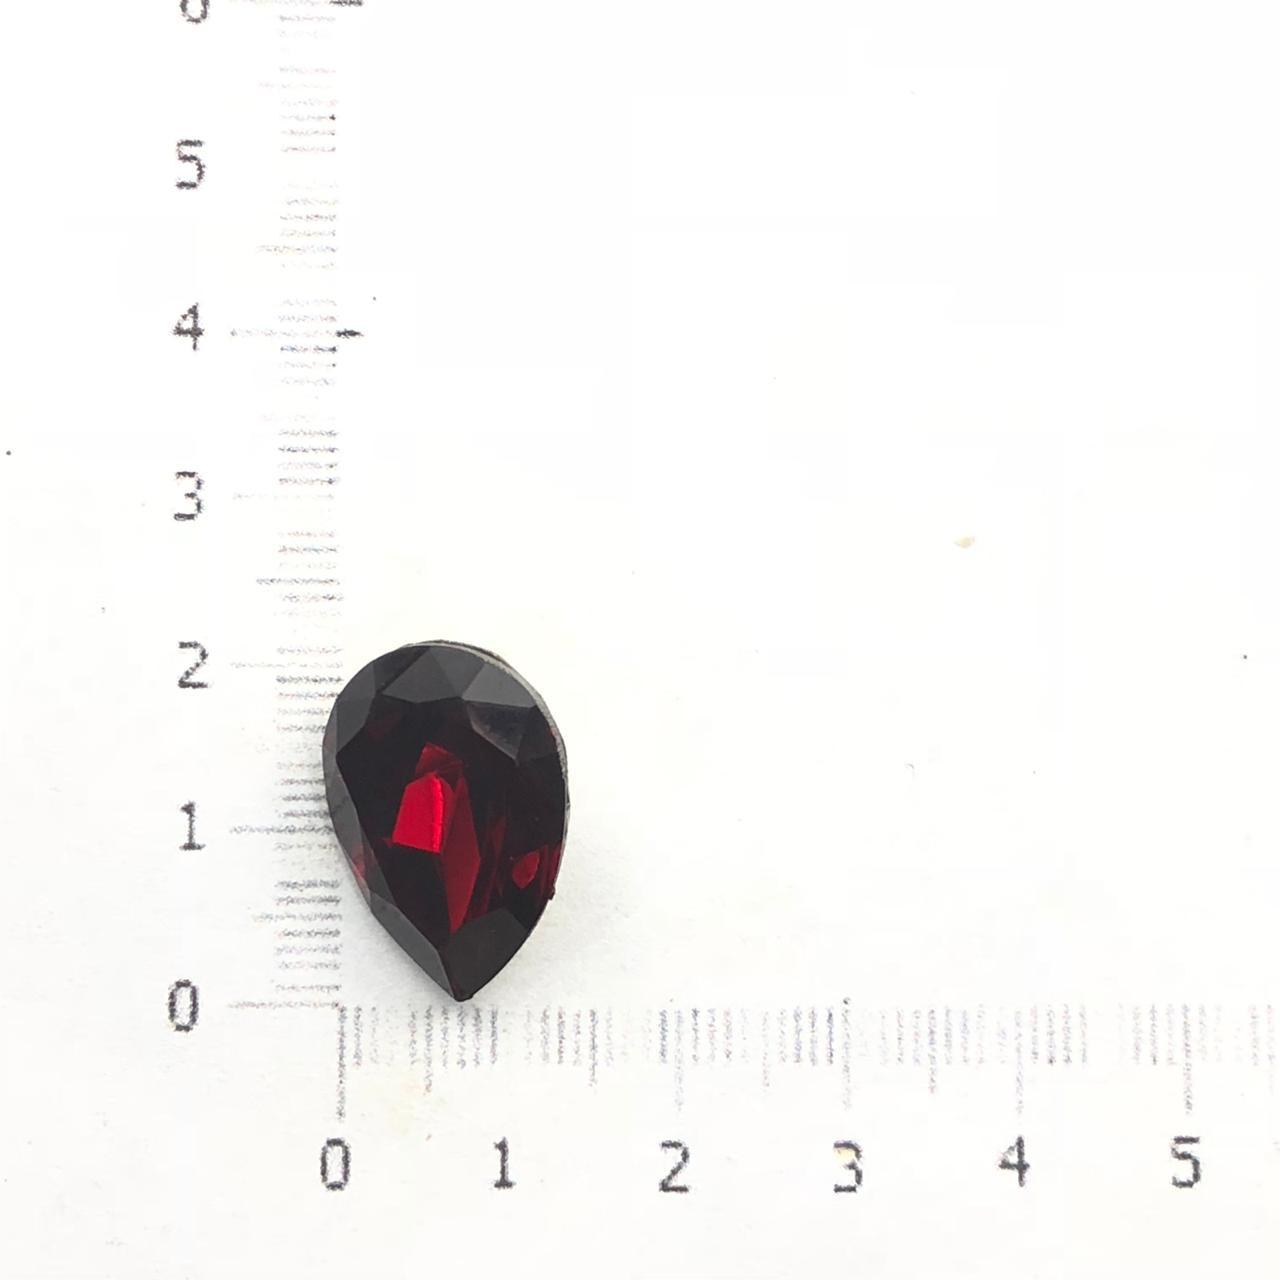 CHT724 - Chaton Gota 13x18 Base Côncava Garnet - 2unids